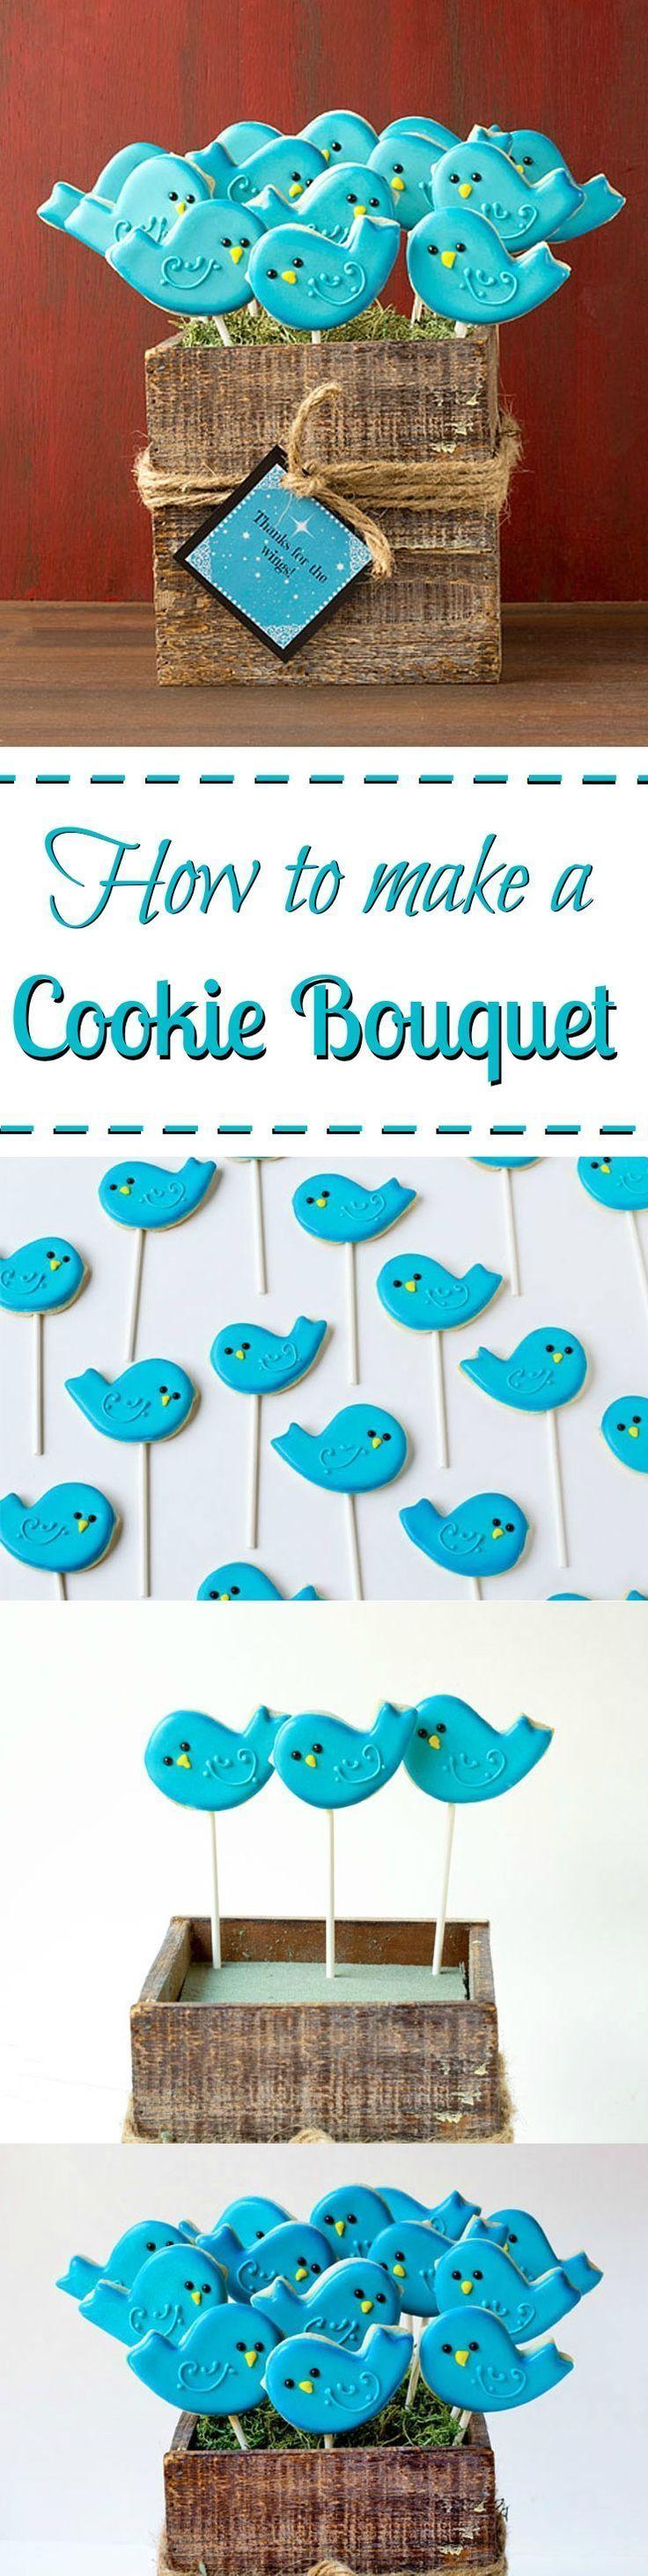 How to make a simple cookie bouquet   The Bearfoot Baker   #bearfootbaker #decoratedcookies #edibleart #cookieart #royalicing #rolloutcookies #simplecookietutorial #birdcookies #cookiebouquet